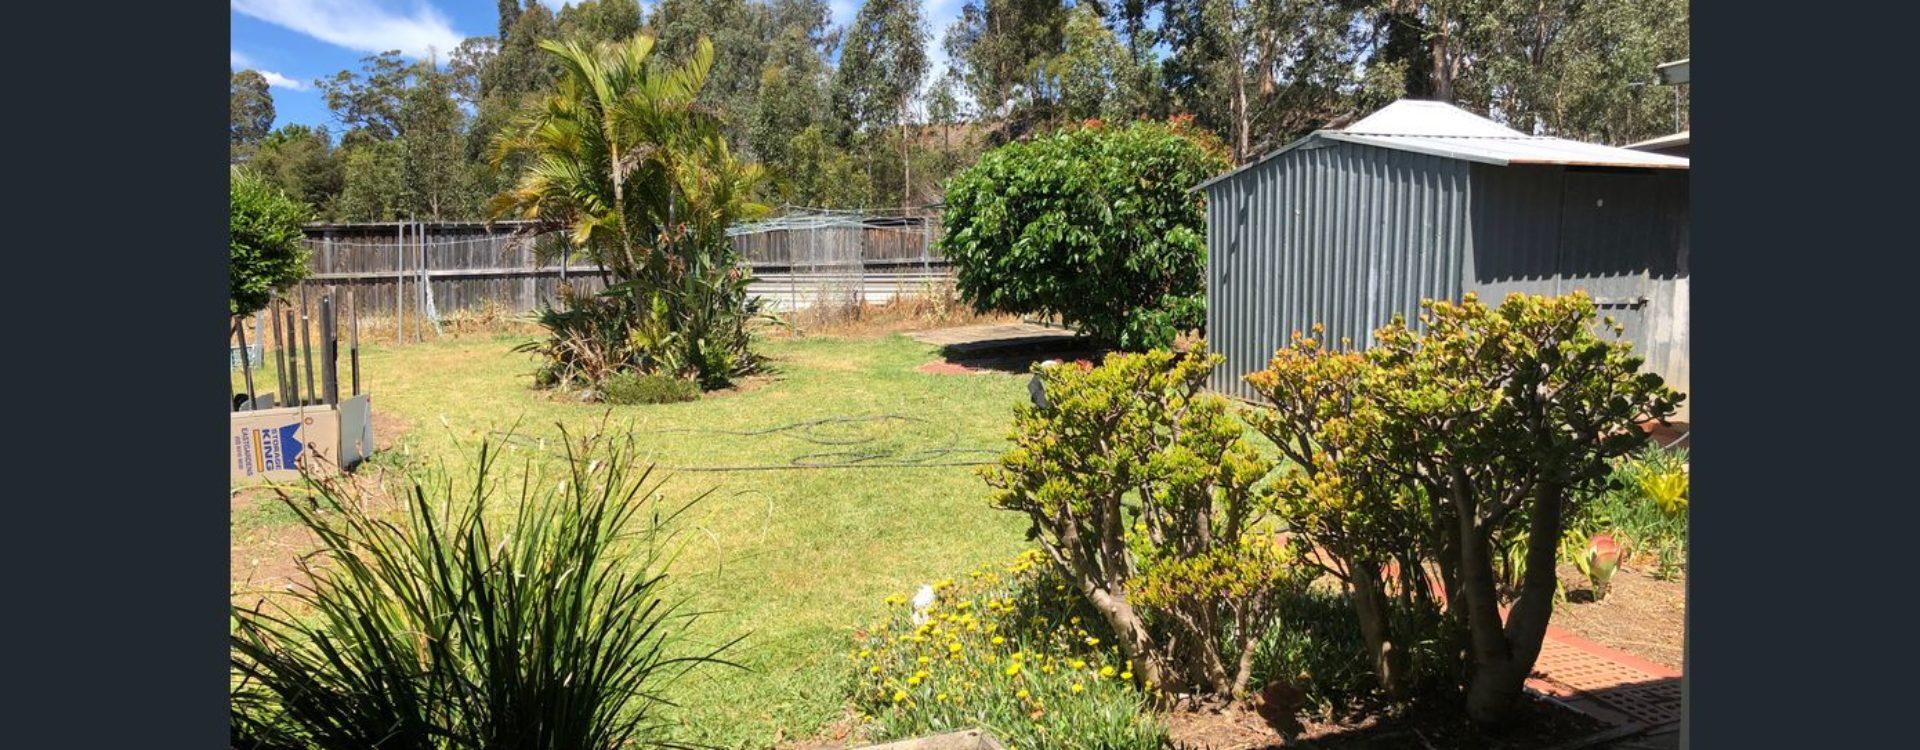 115 Cooper Road, Birrong NSW, 2143